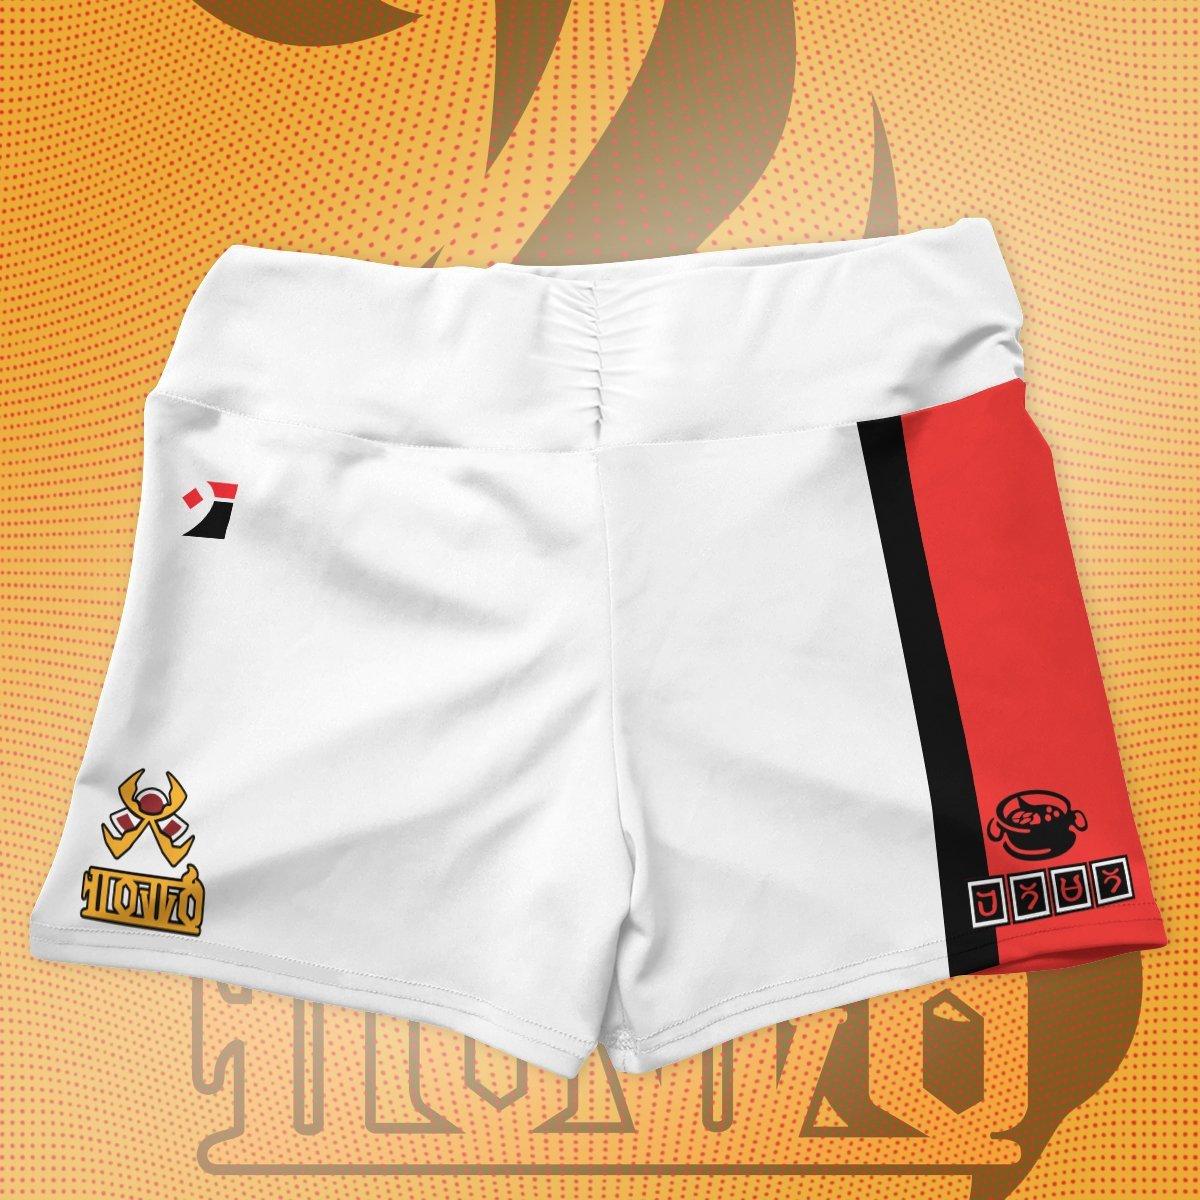 pokemon fire uniform active wear set 515761 - Anime Swimsuits